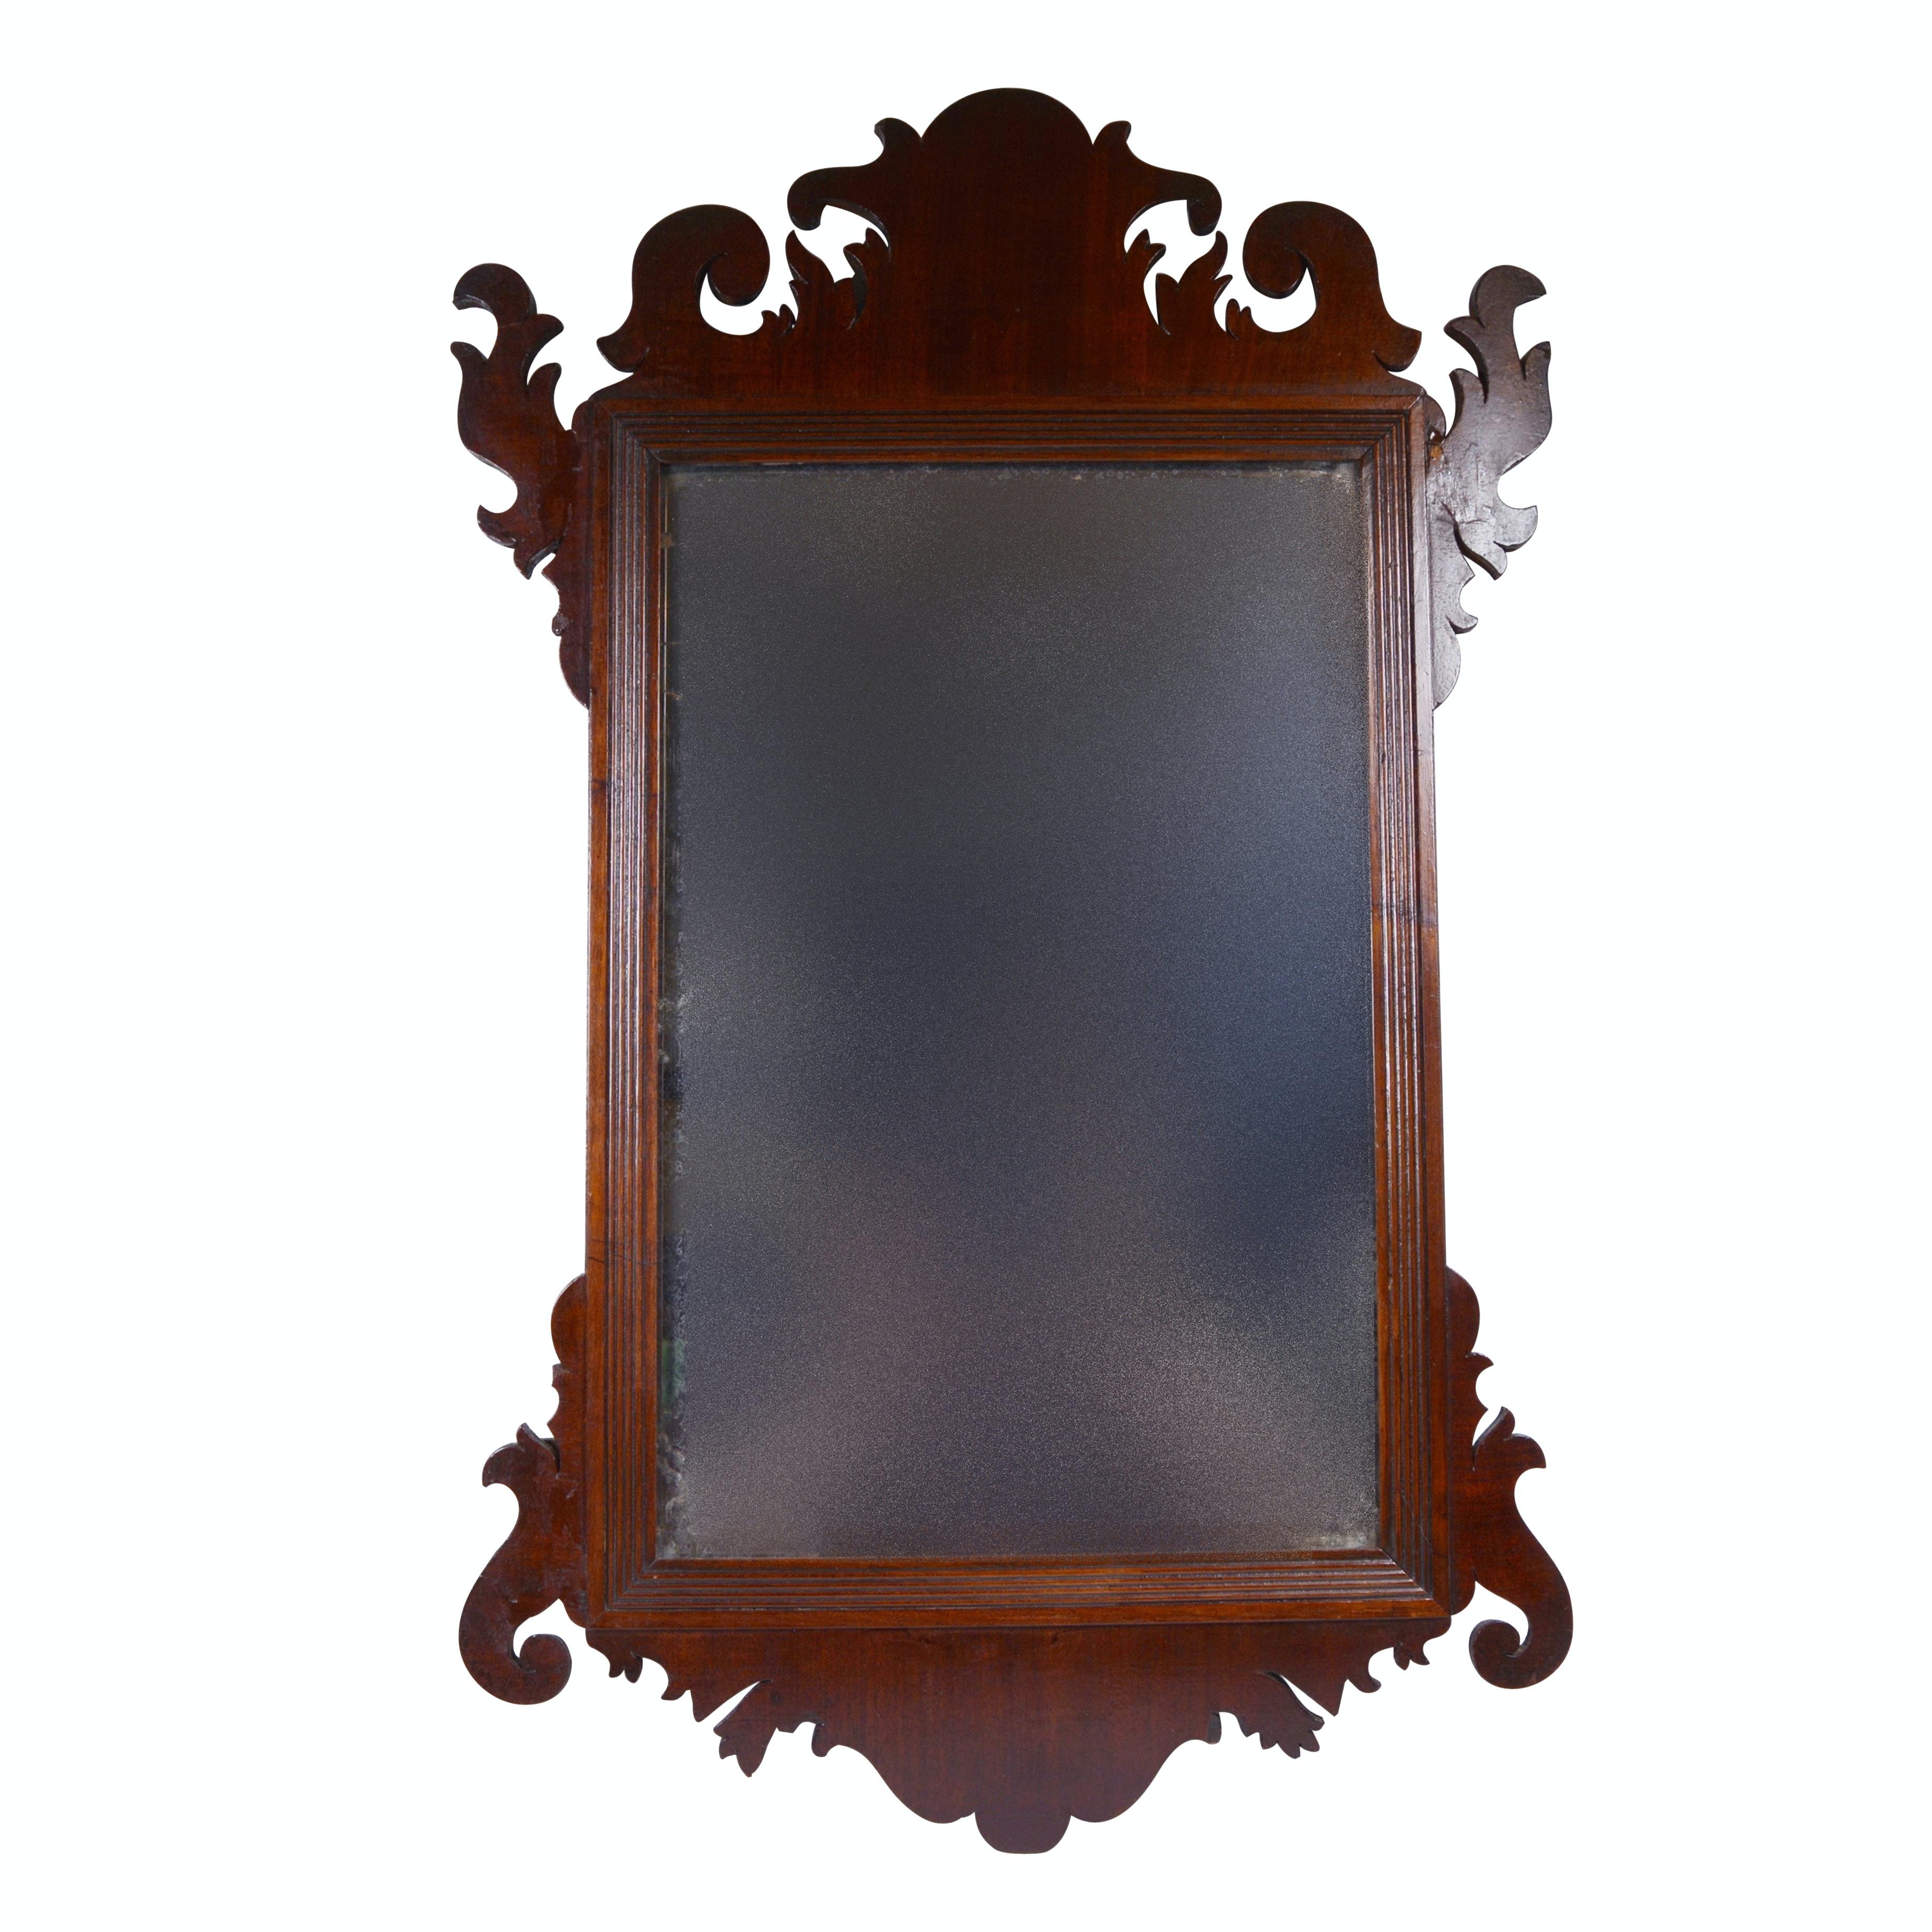 Chippendale Style Mahogany Veneer Wall Mirror